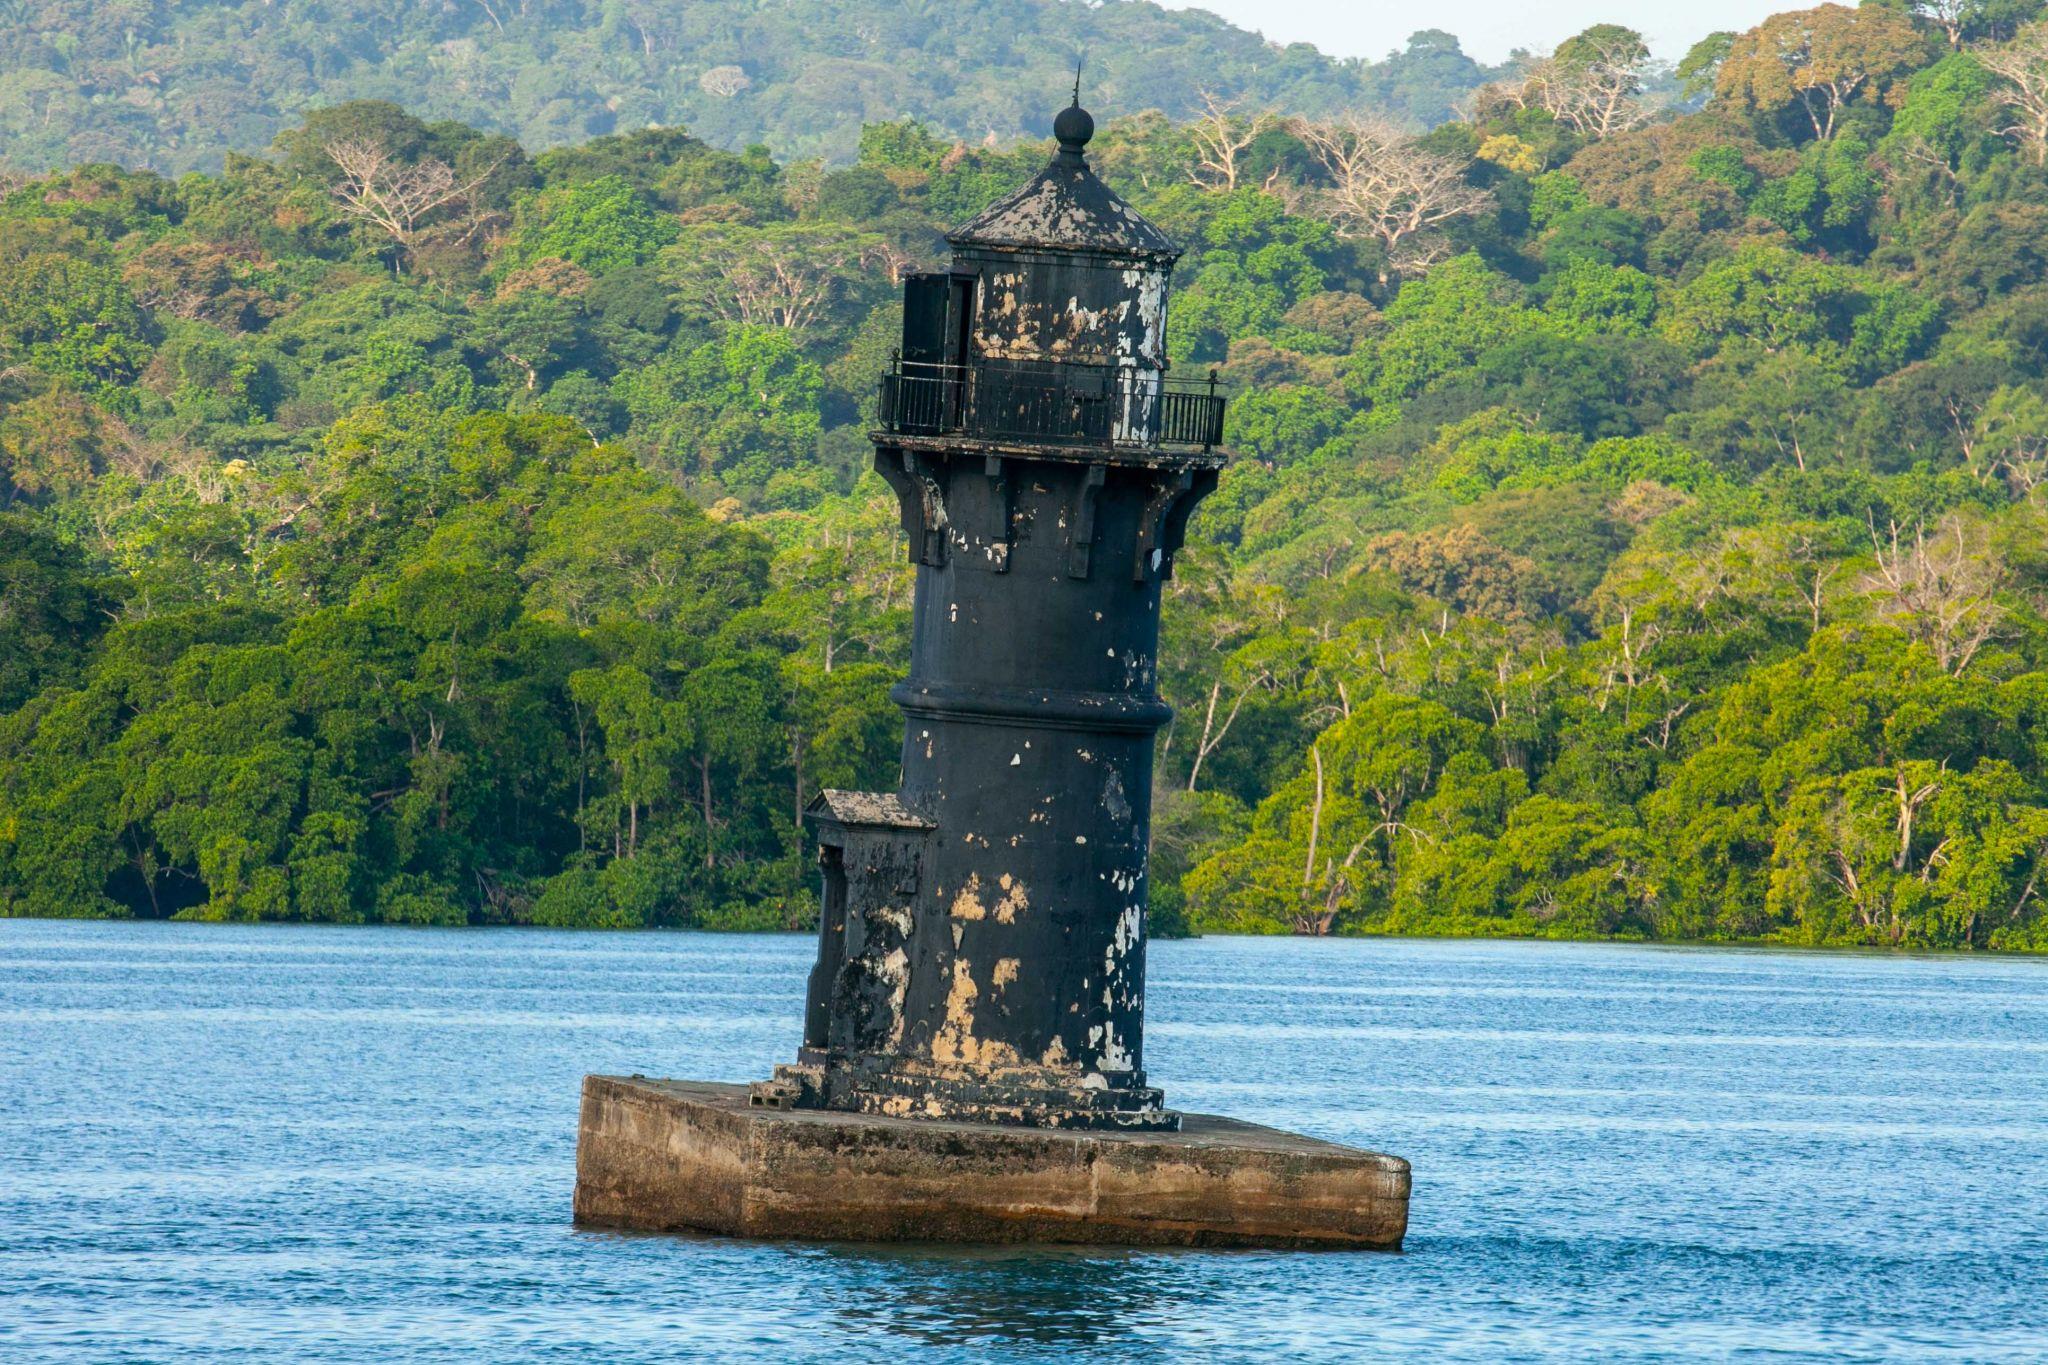 Old Lighthouse on the Panama Canal, Panama